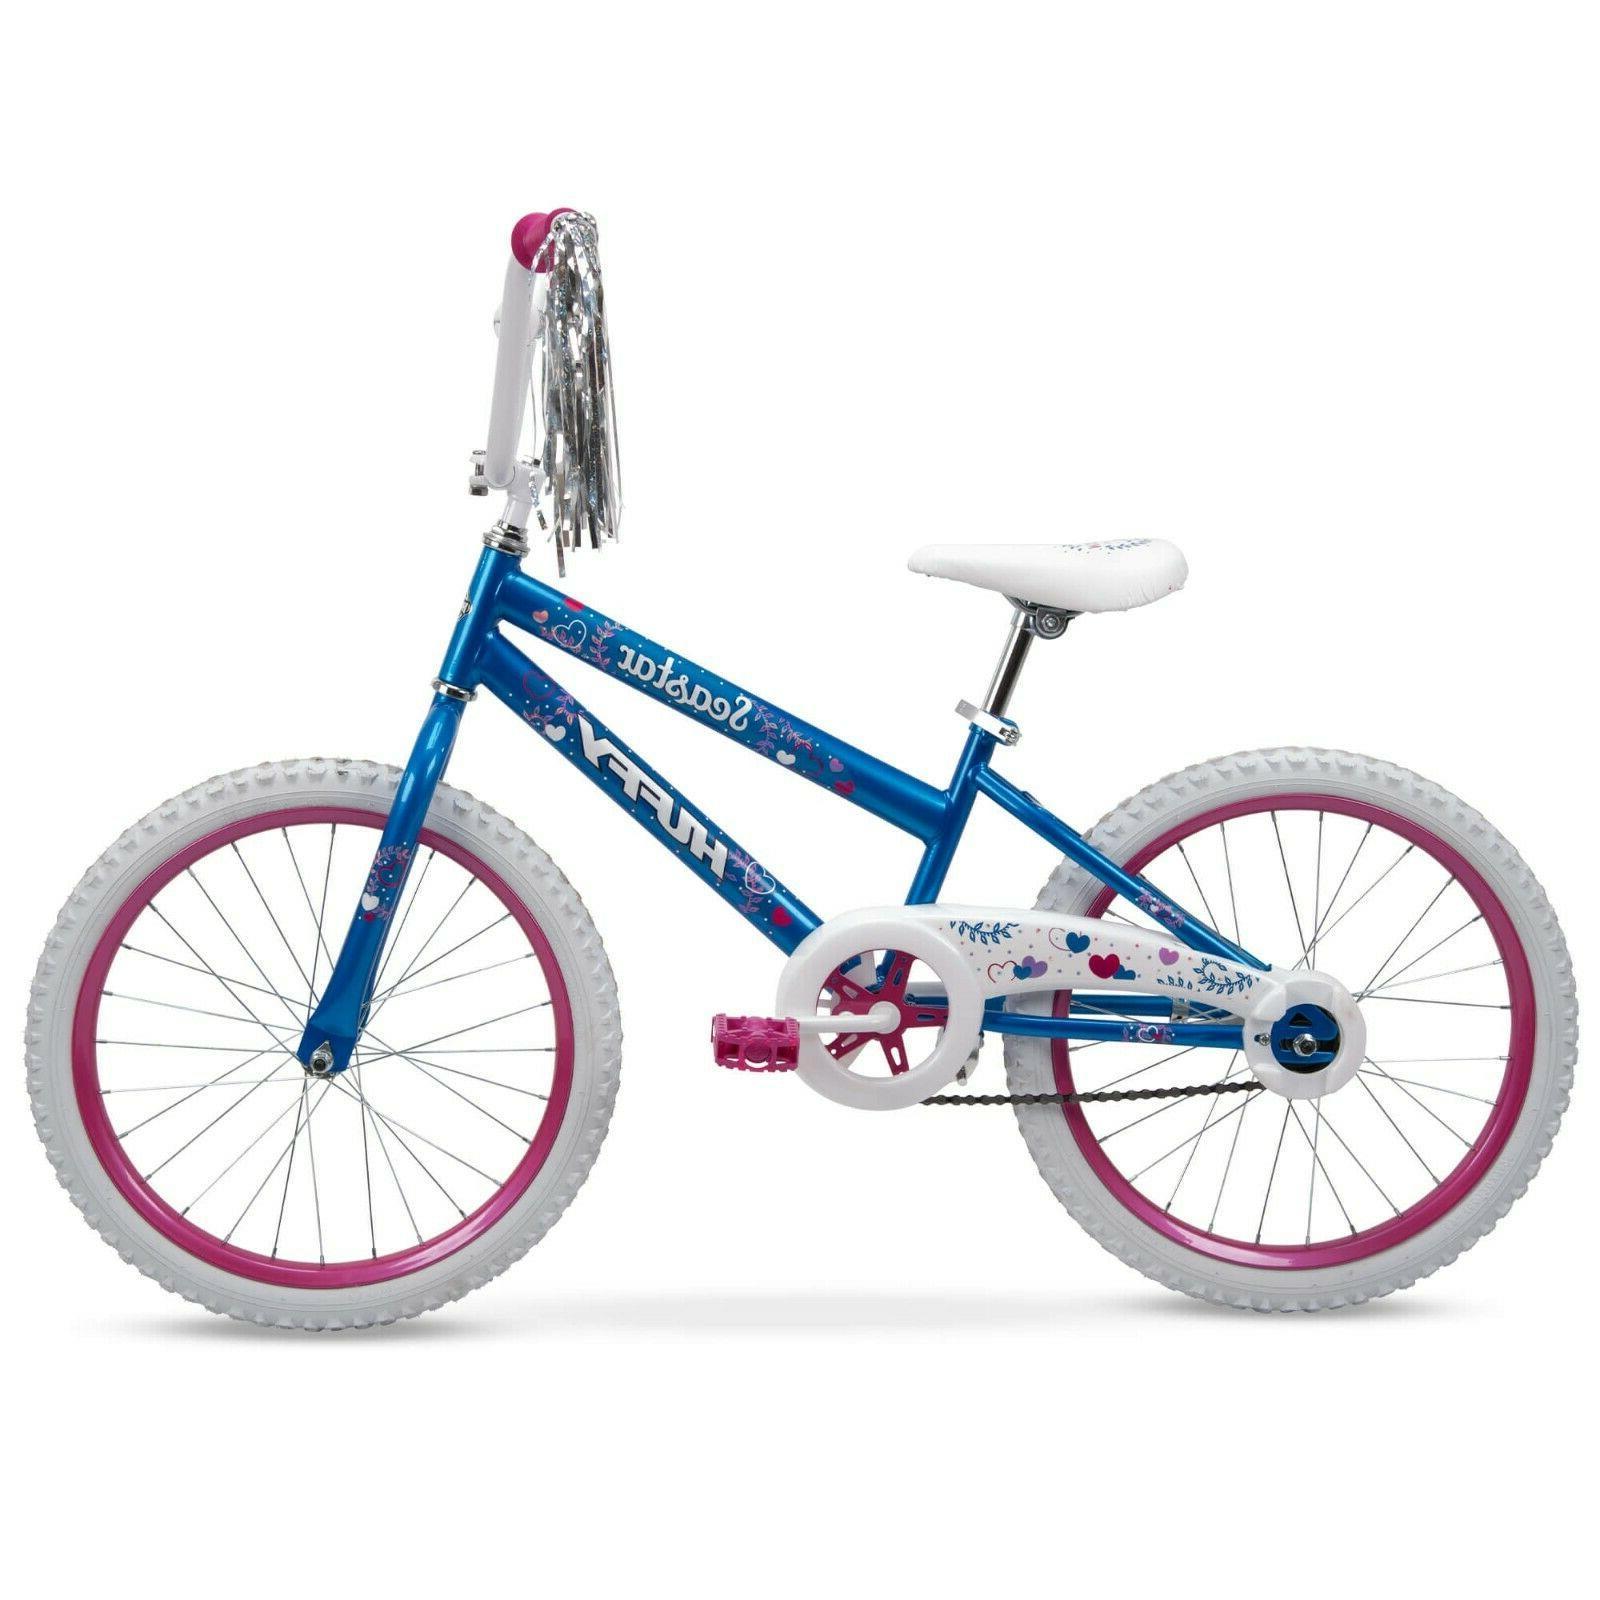 "20"" Kids Bike Girls BMX Bicycle Sidewalk 20-inch Tween Frees"